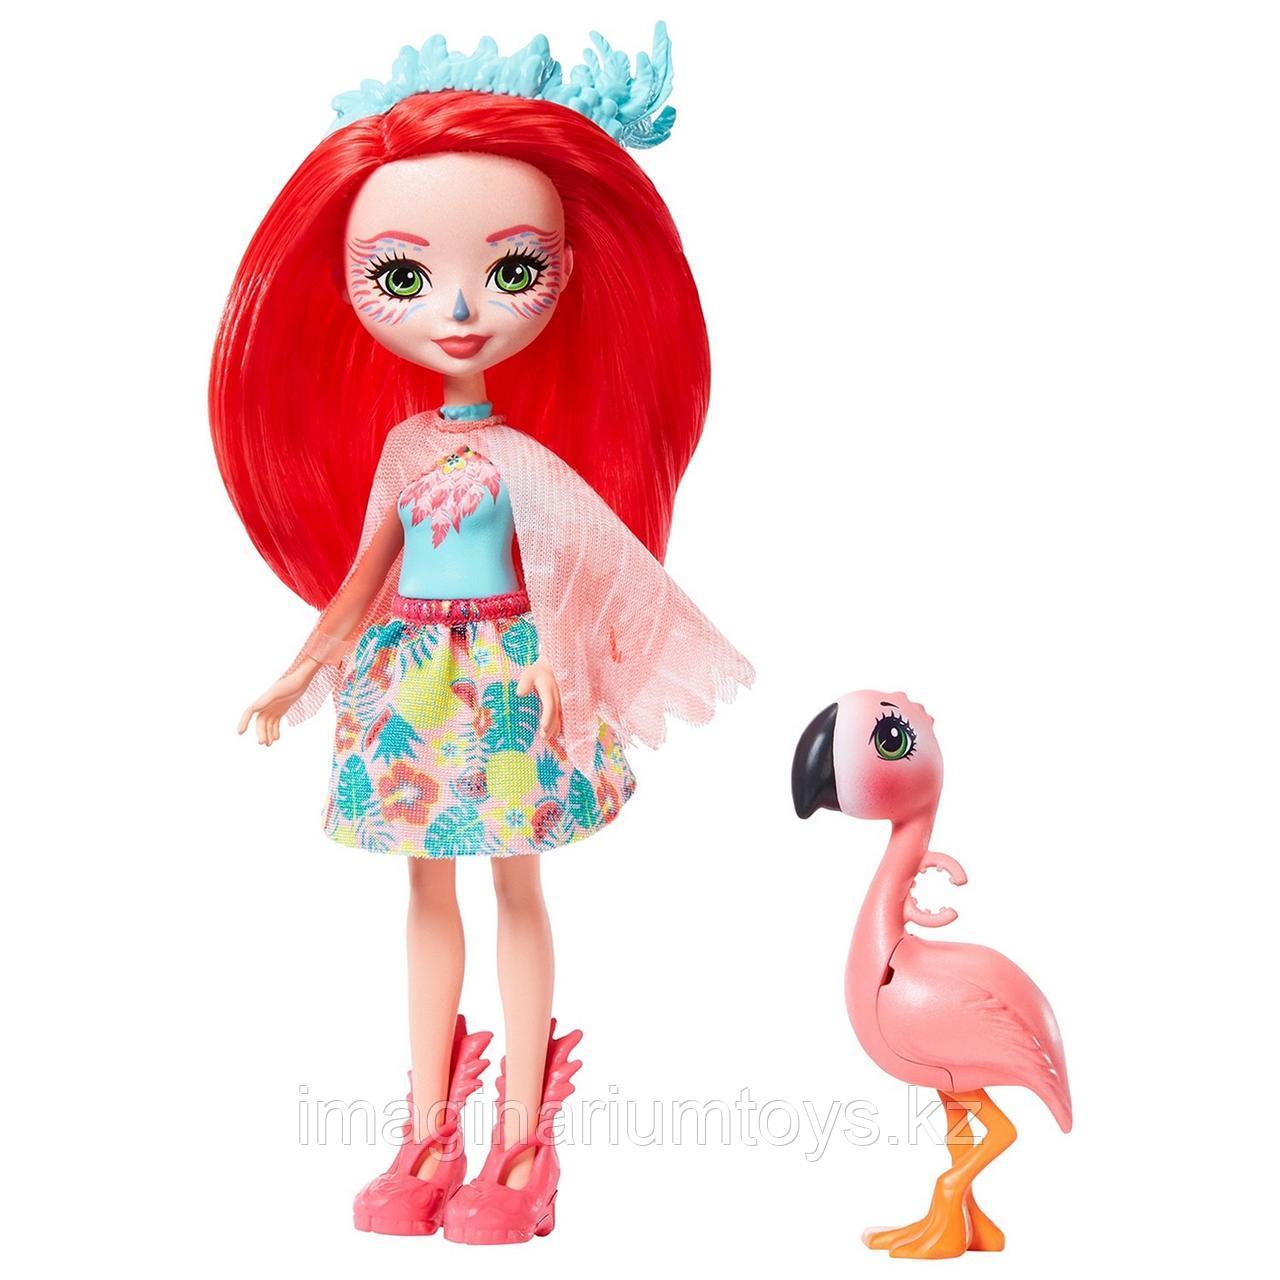 Кукла Энчантималс фламинго Фэнси и Свош